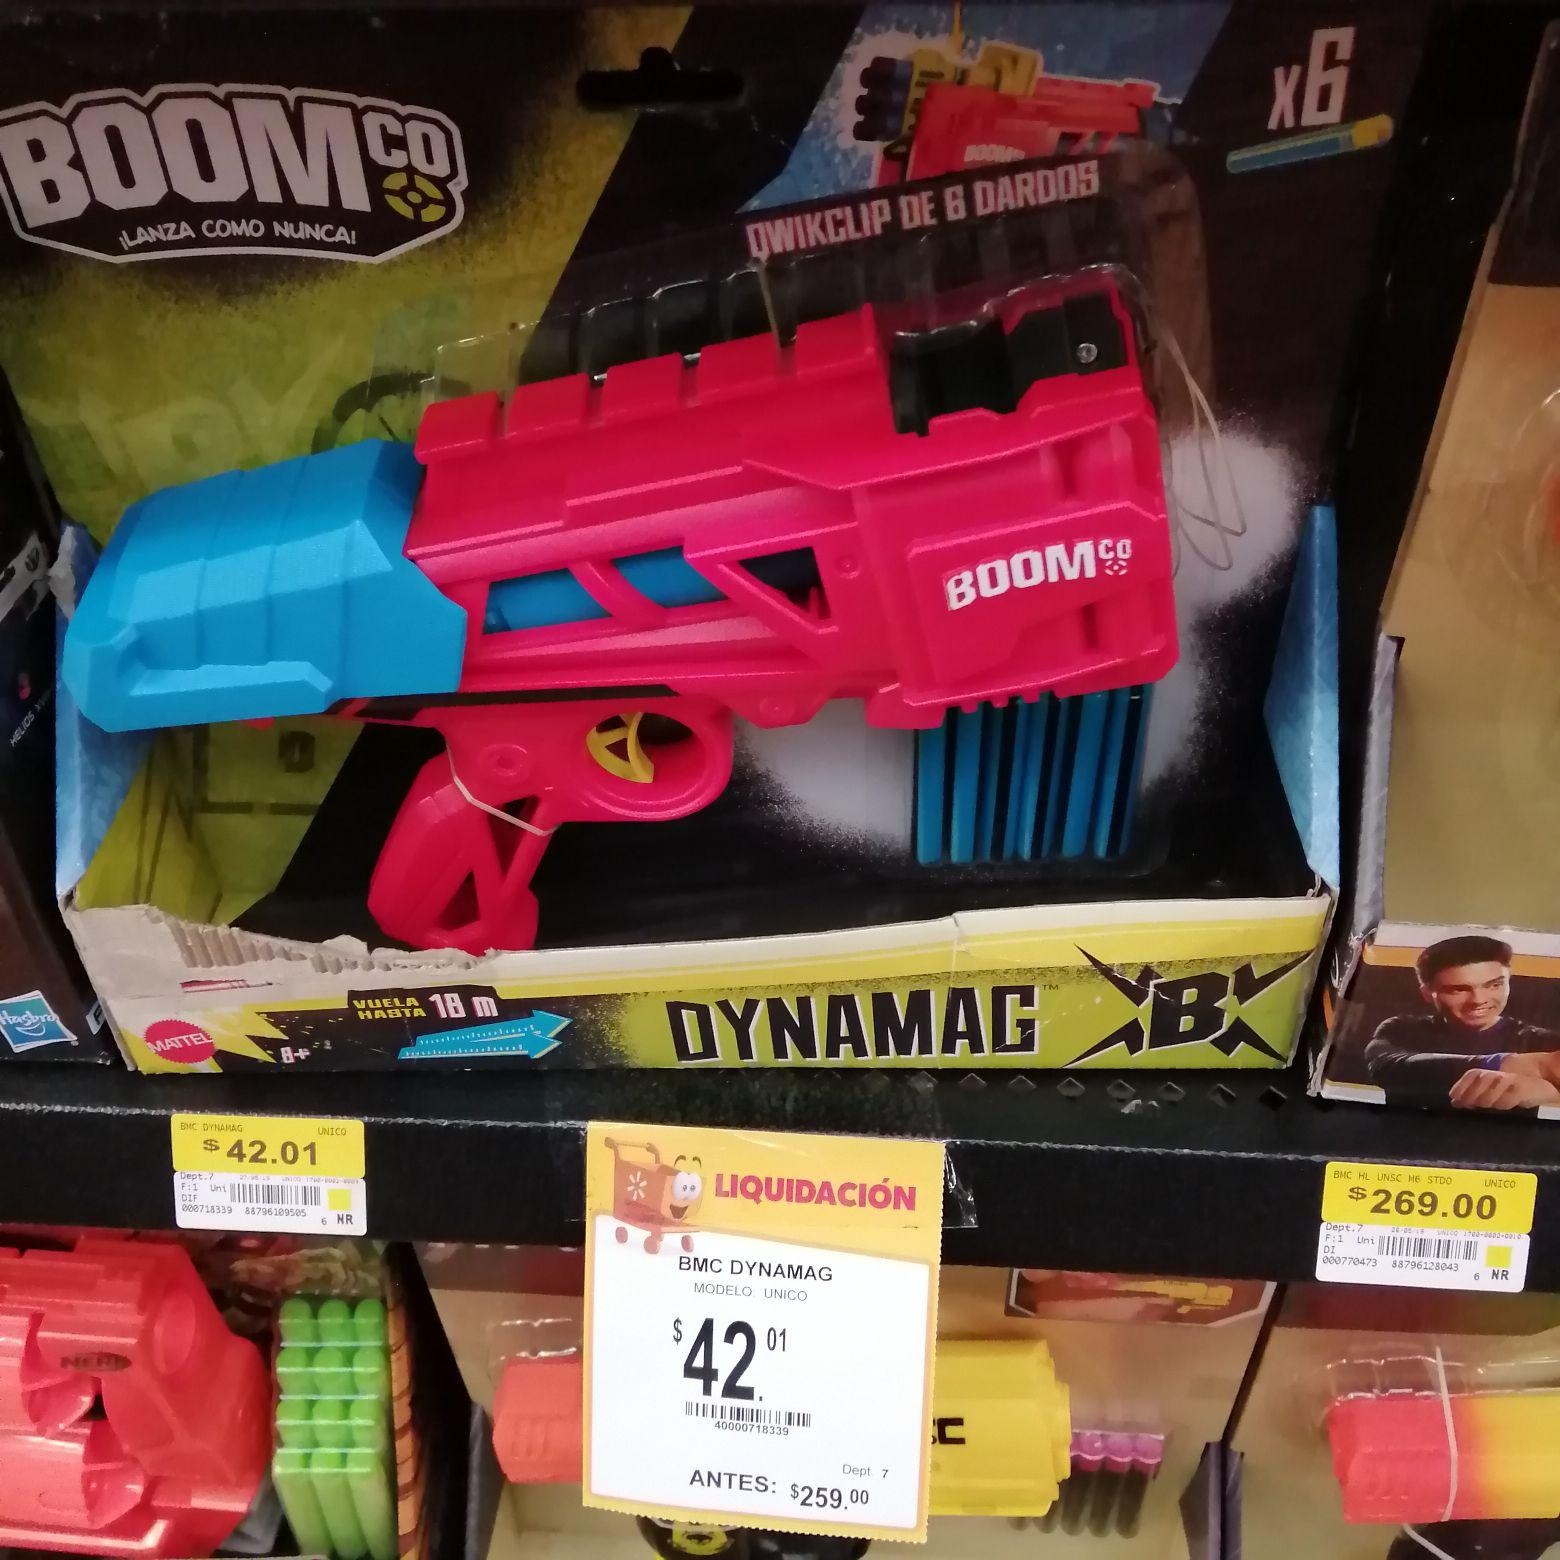 Walmart Boom dynamag lanza dardos hasbro